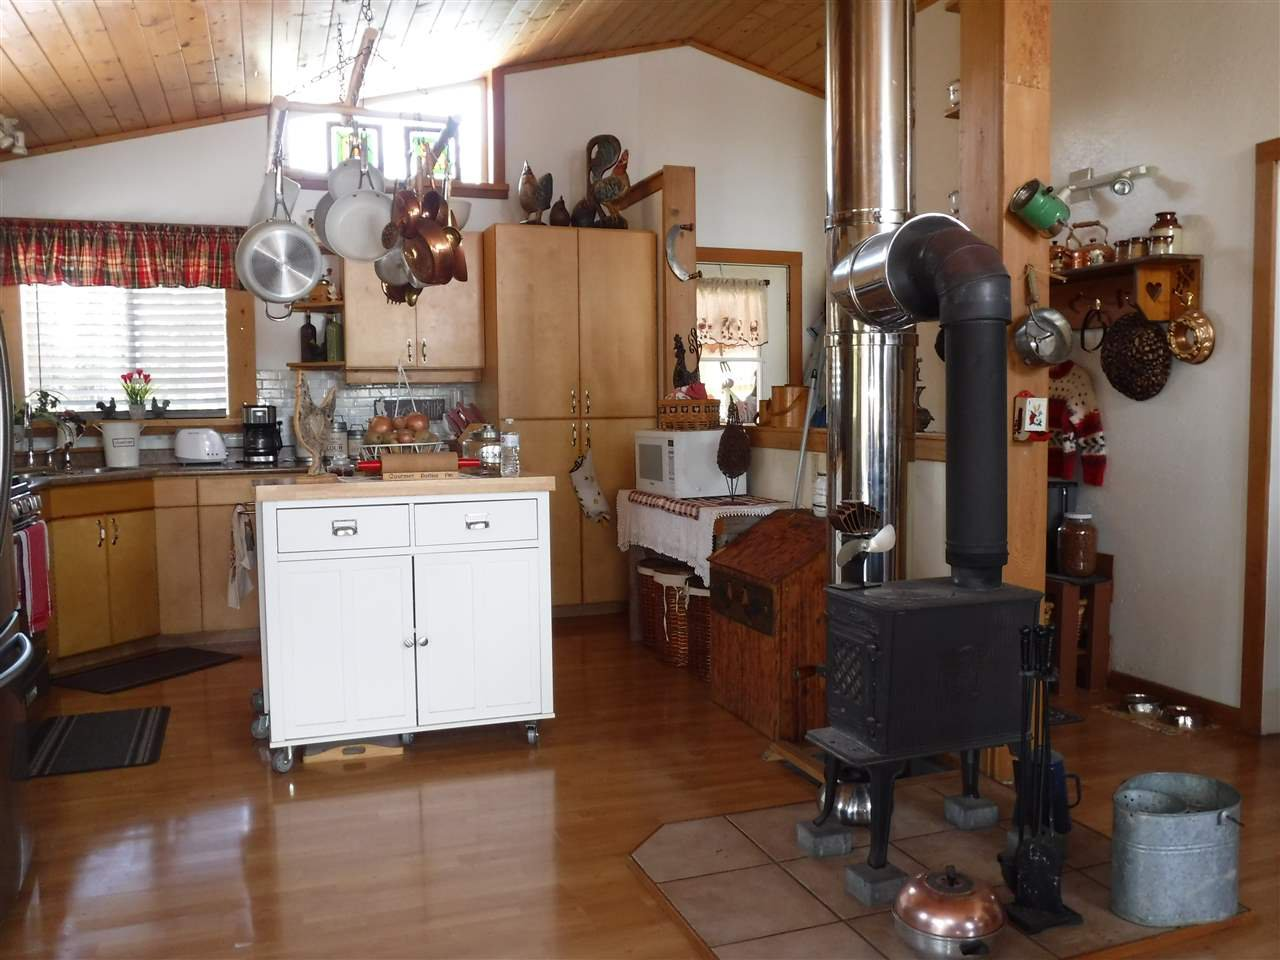 Photo 22: Photos: 3126 ELSEY Road in Williams Lake: Williams Lake - Rural West House for sale (Williams Lake (Zone 27))  : MLS®# R2467730